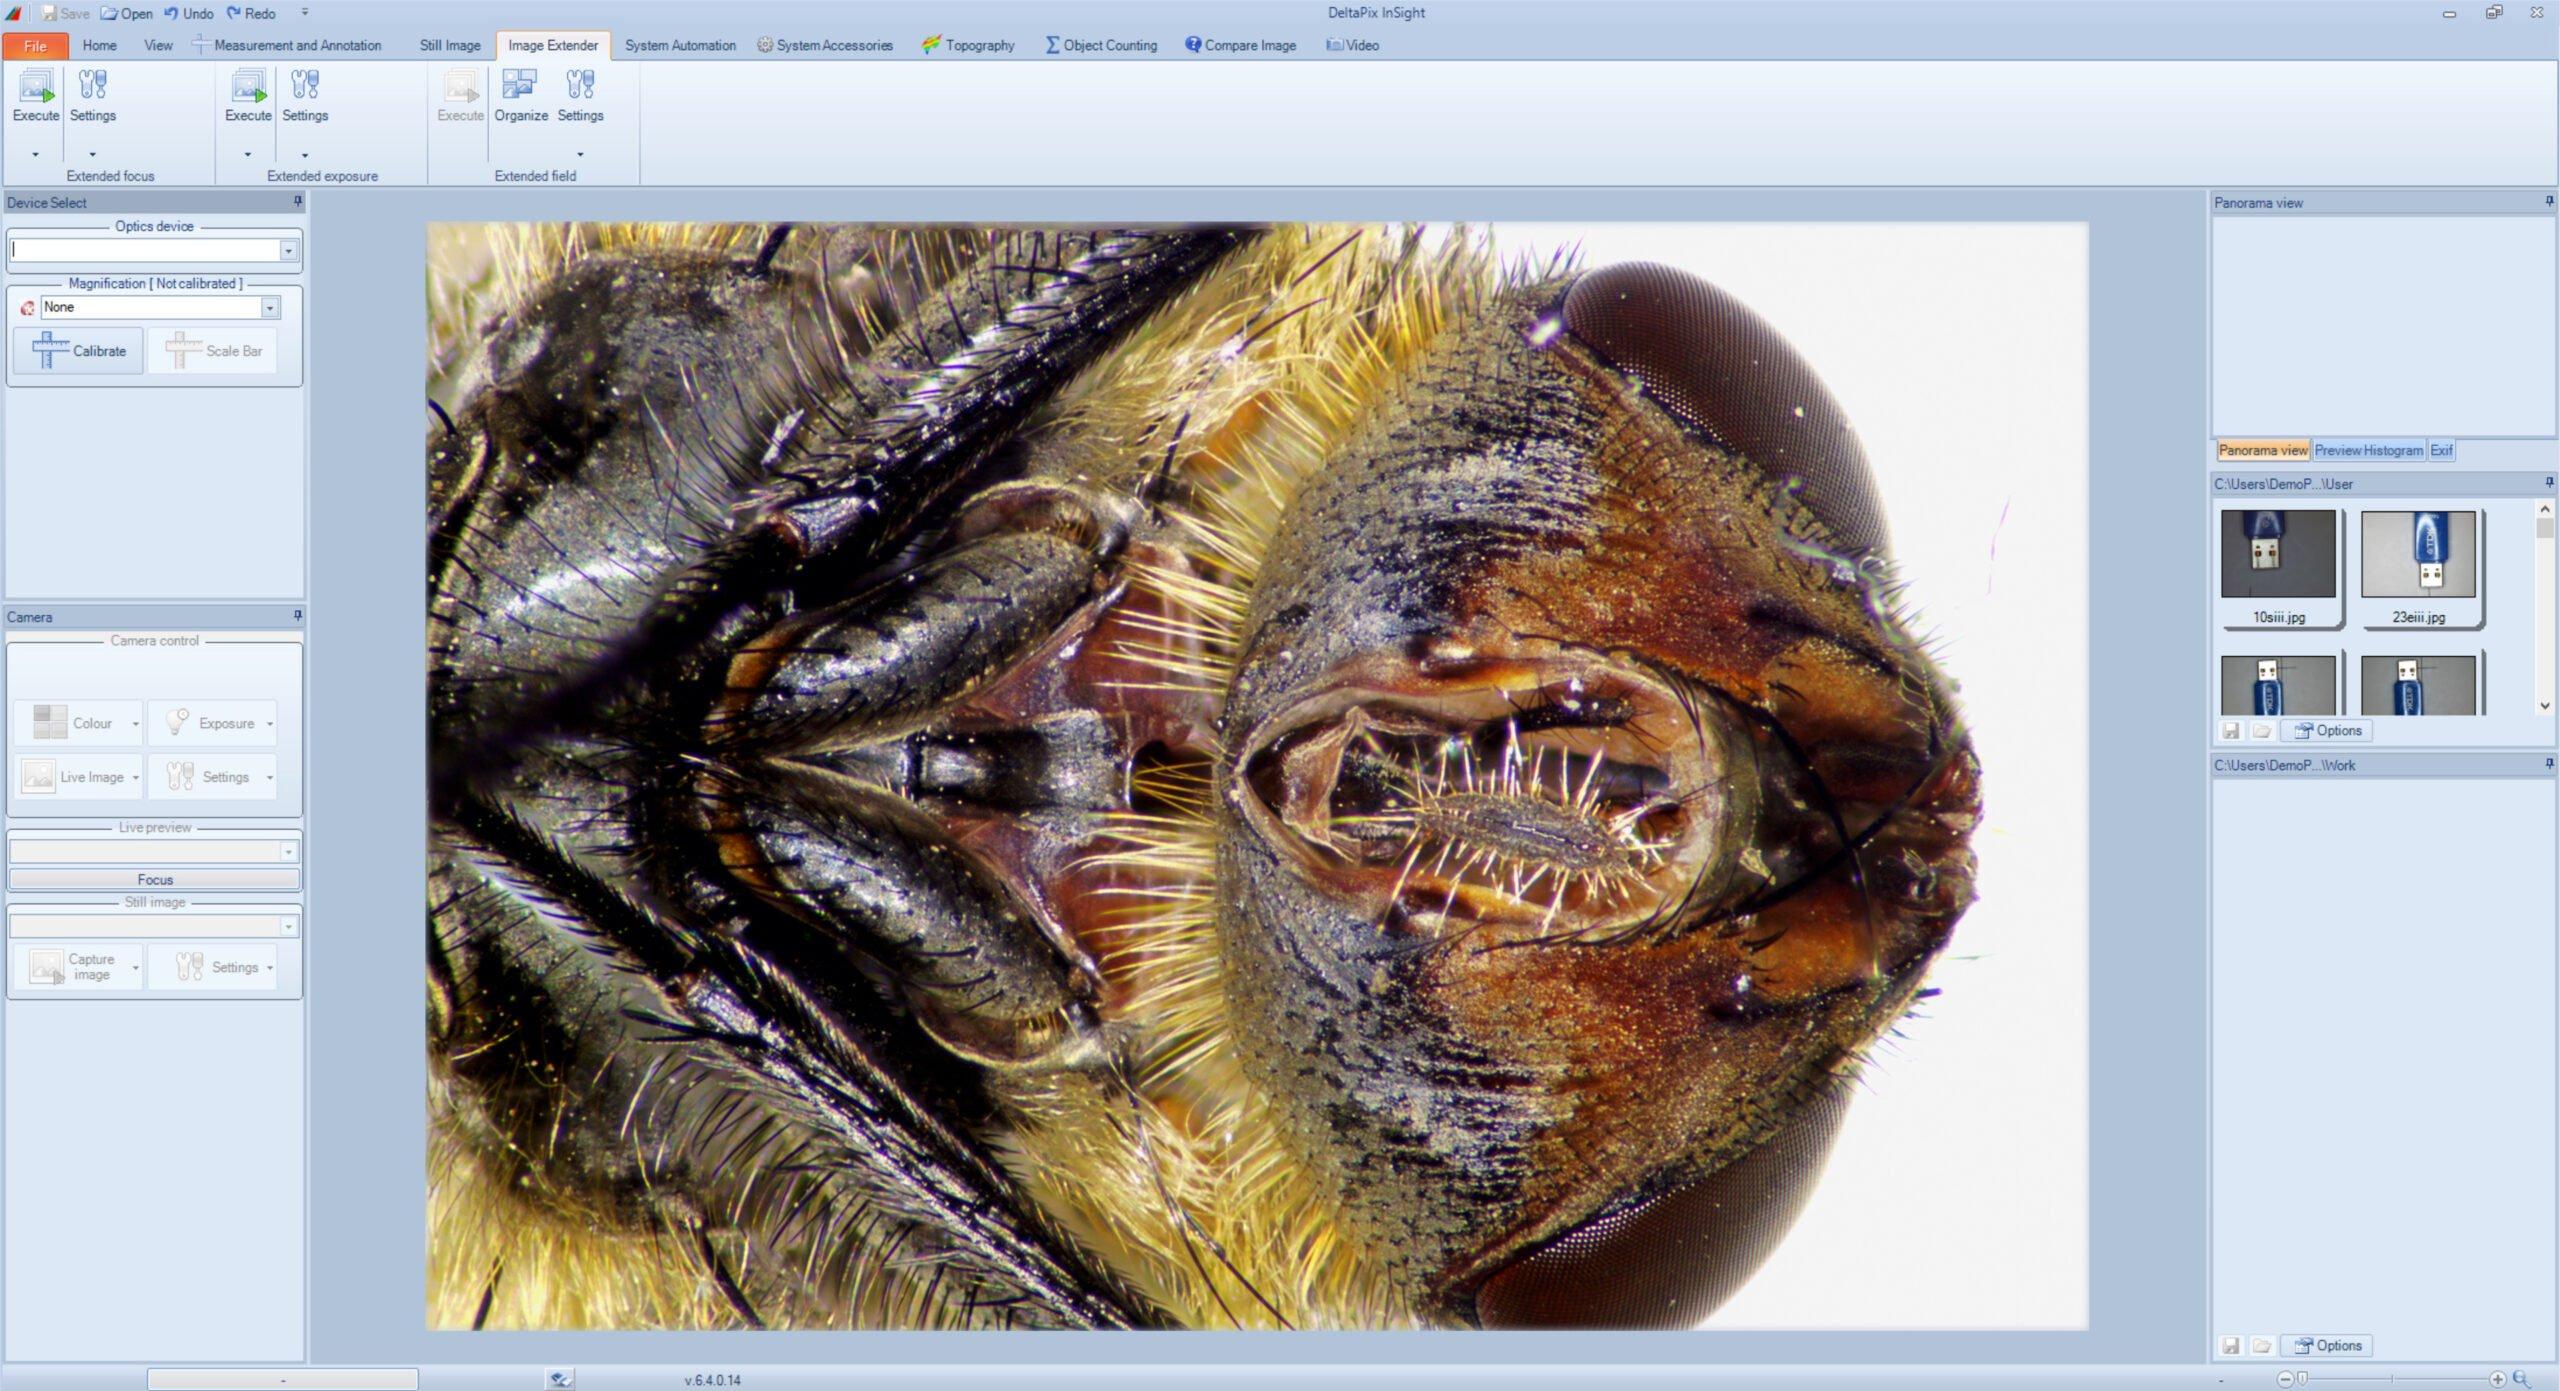 eeef microscope software module